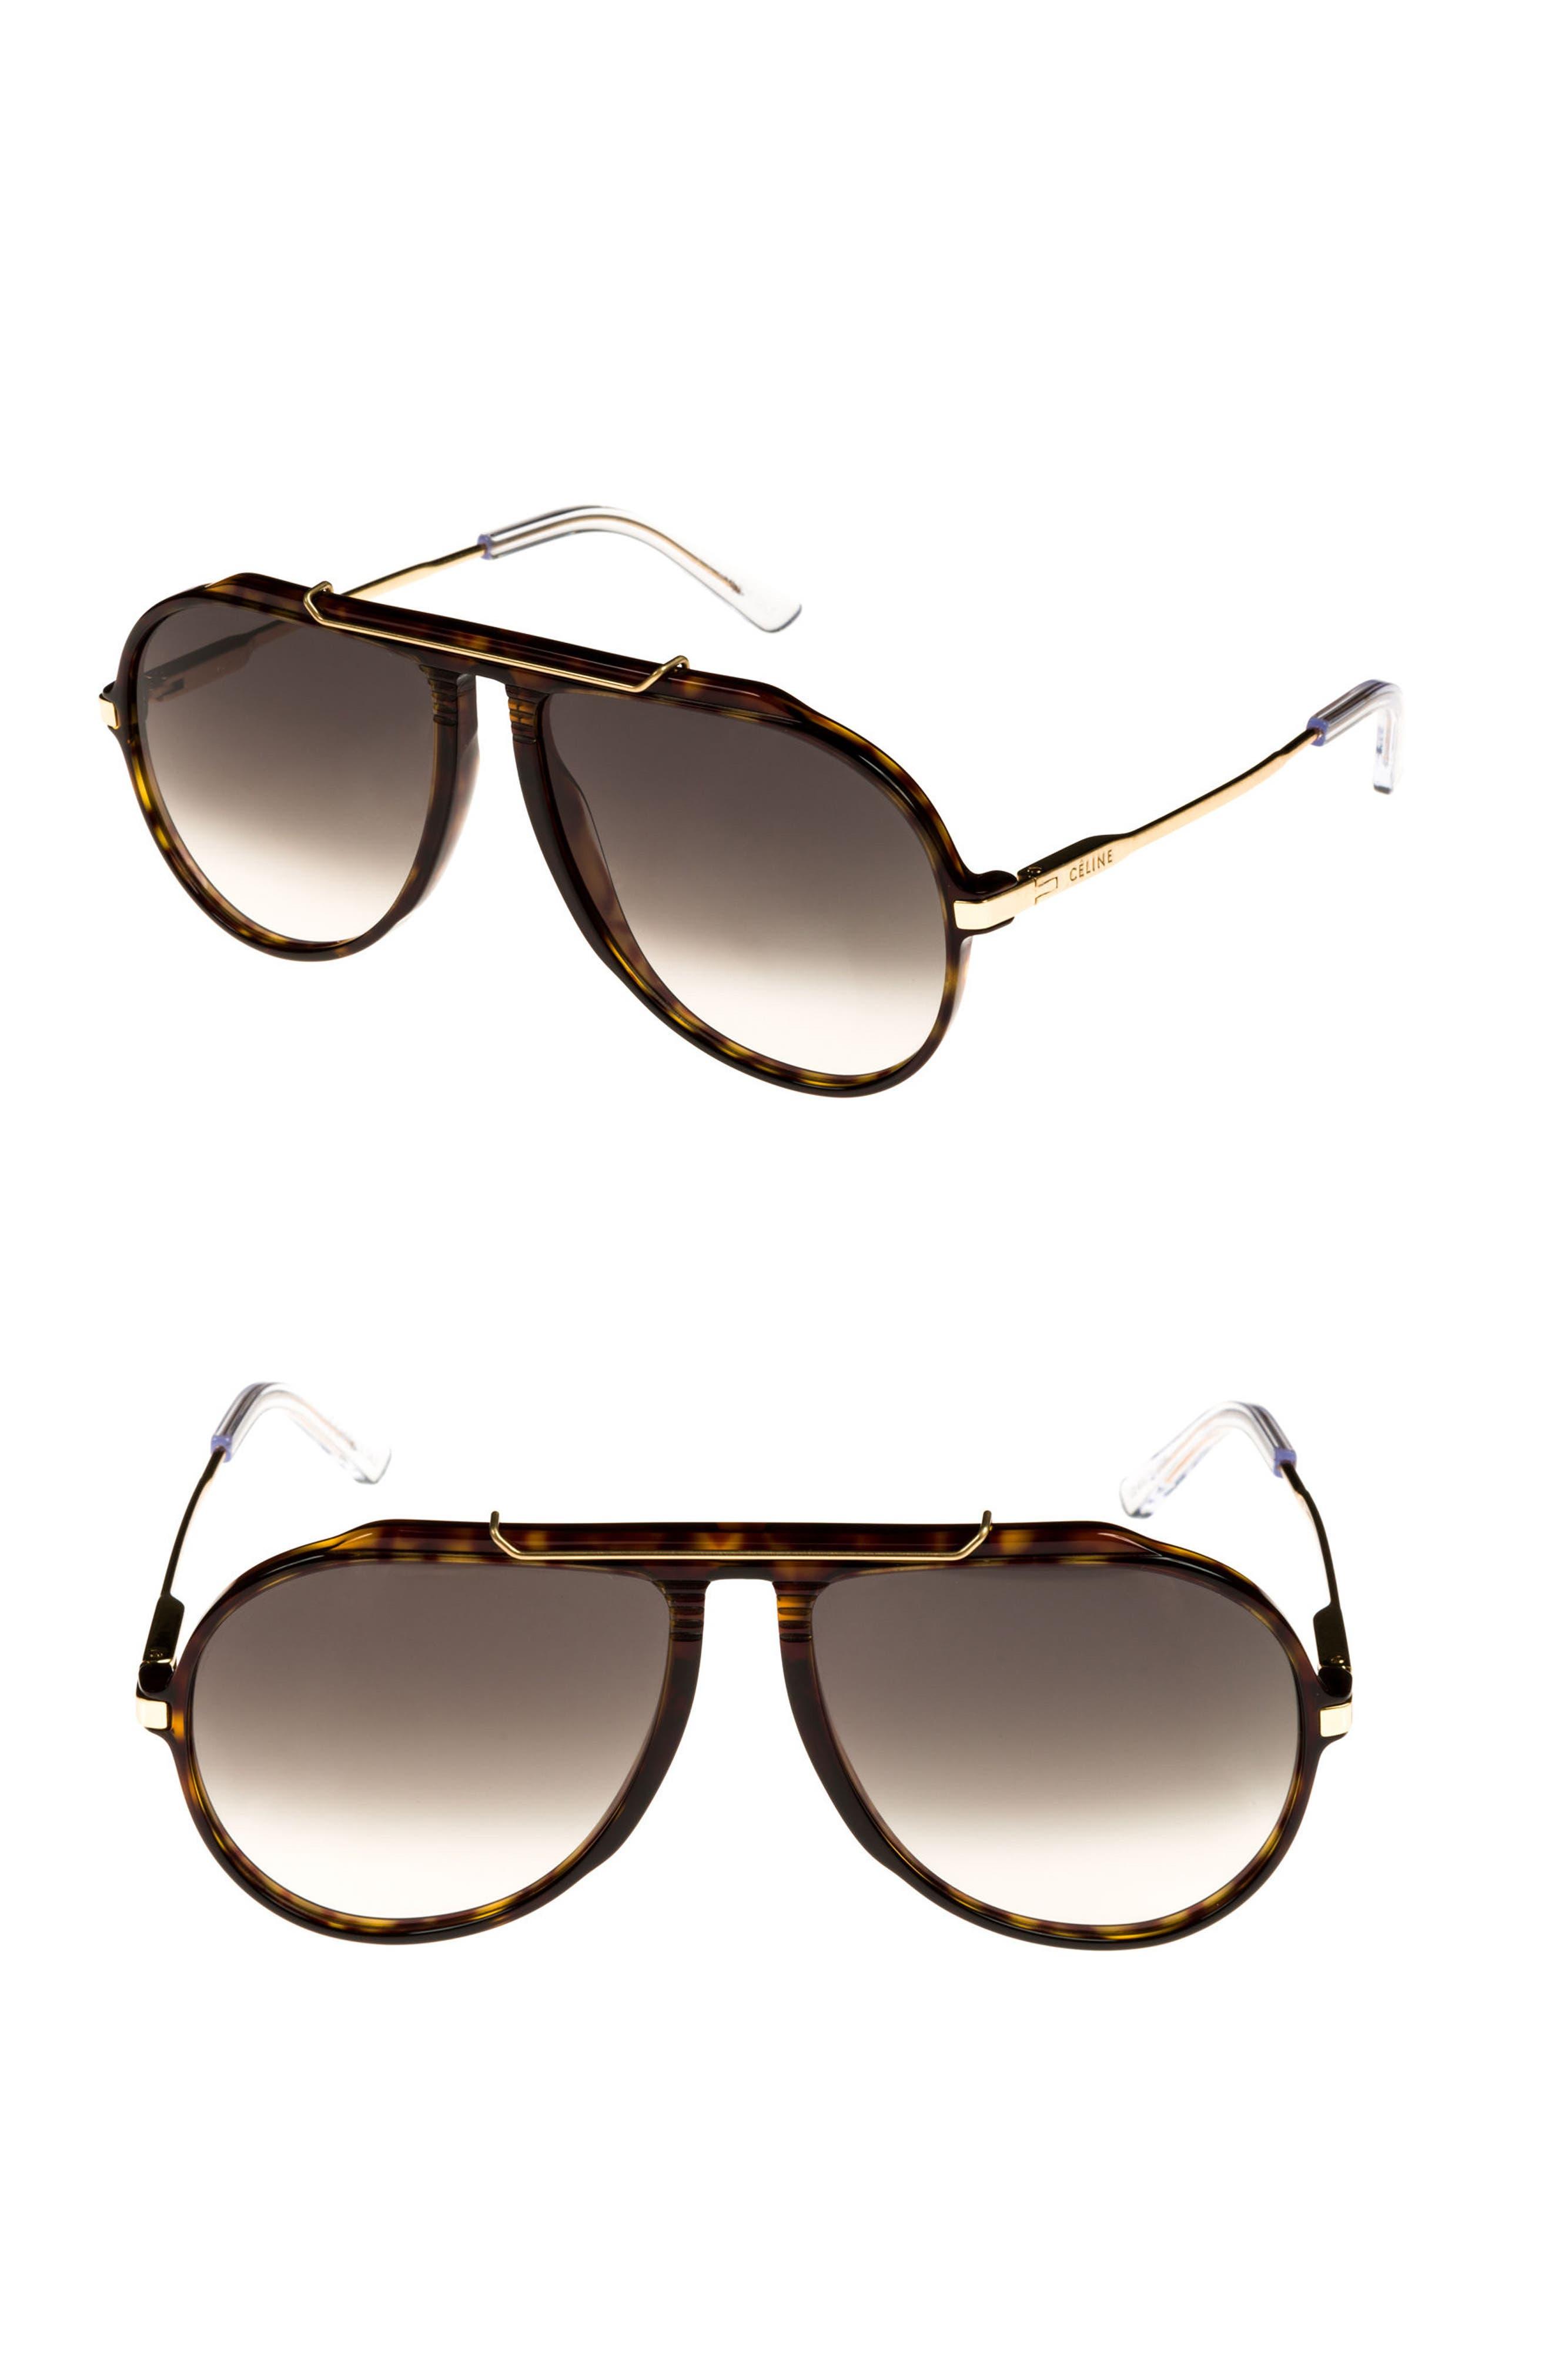 60mm Gradient Aviator Sunglasses,                         Main,                         color, 264